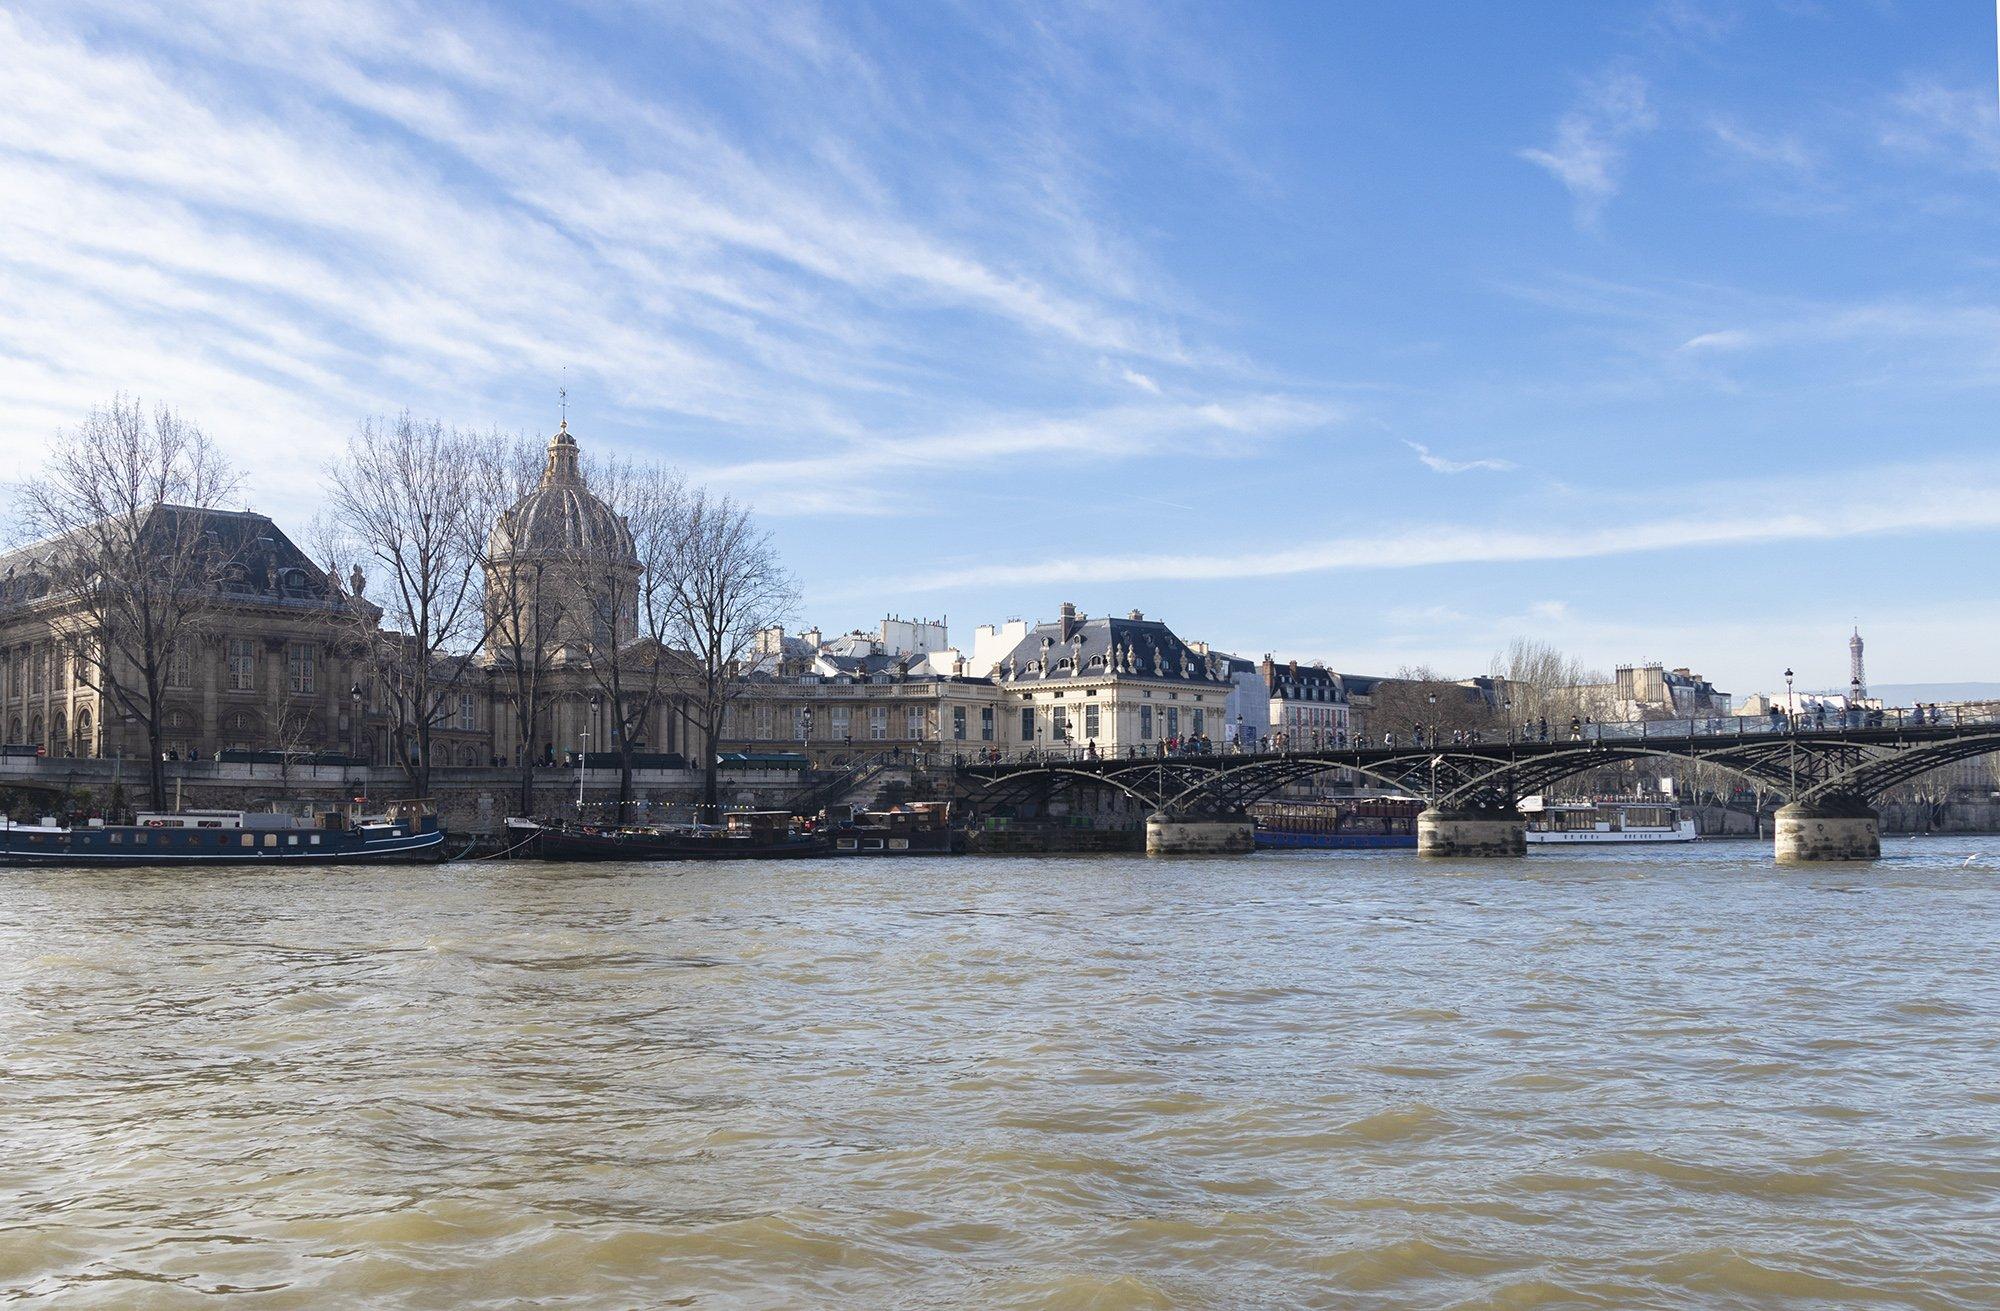 Ponts des Arts, Paris from Seine